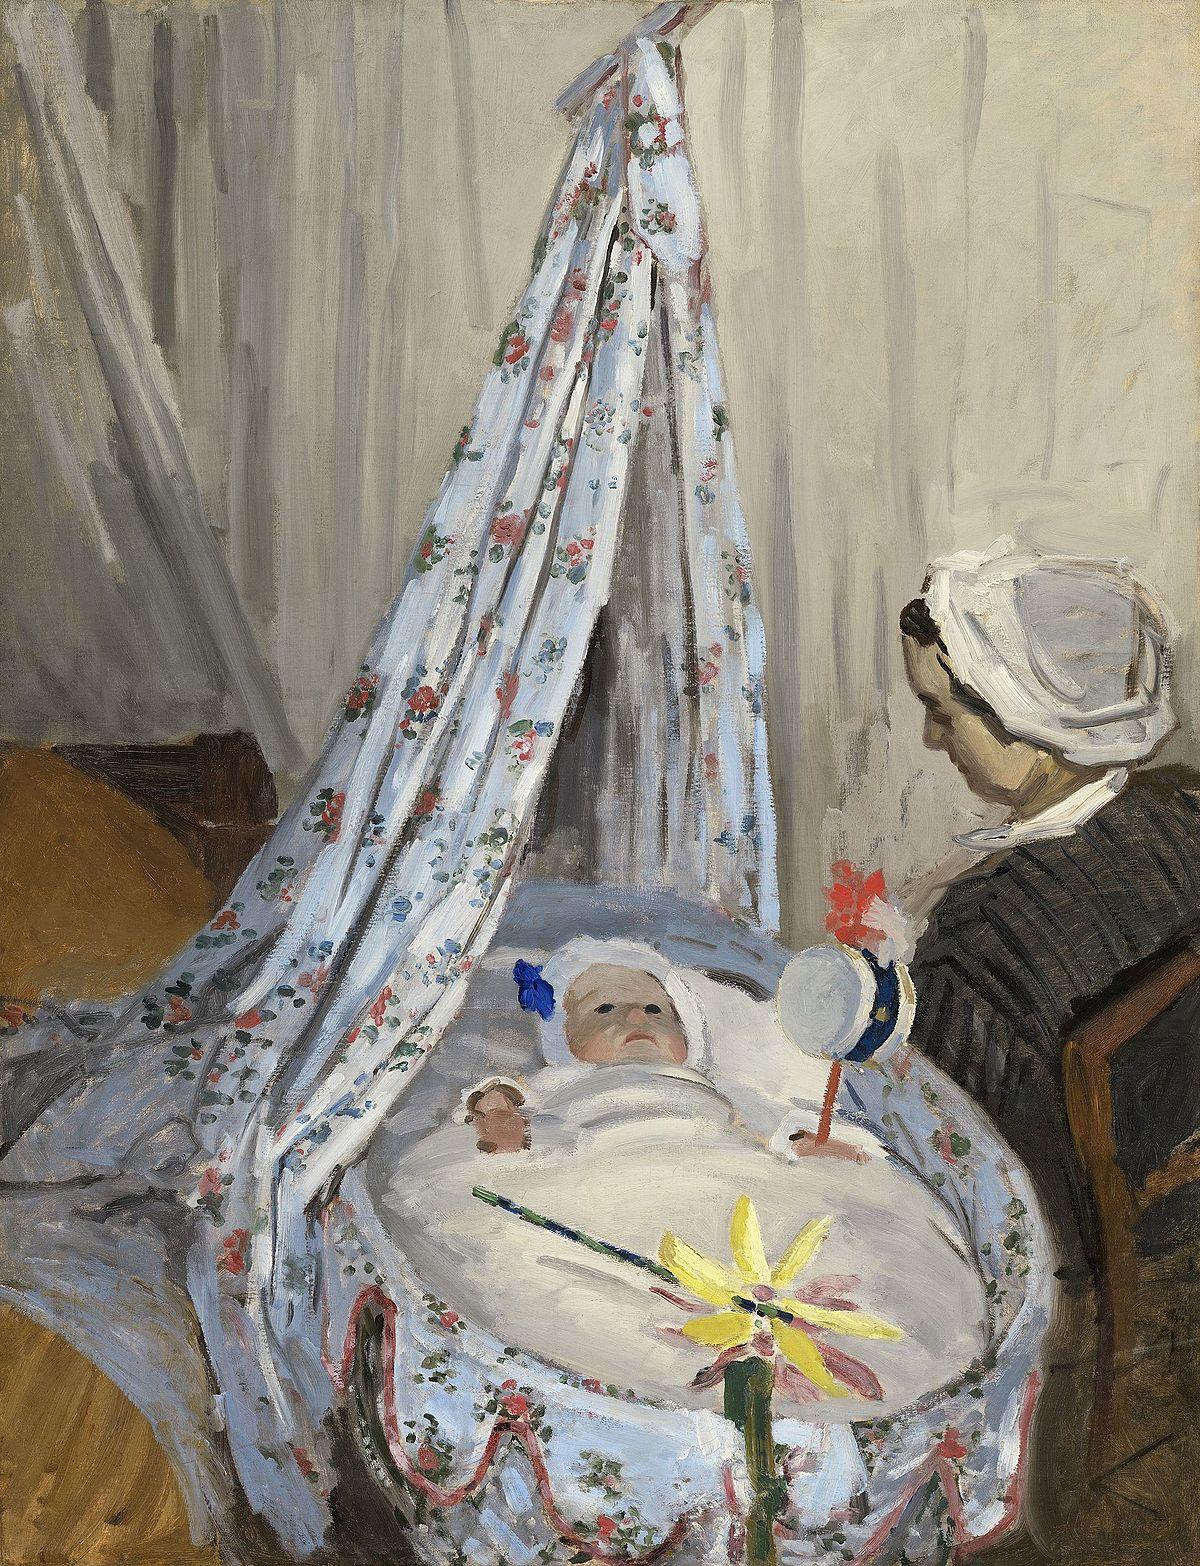 Ficheiro:The Cradle - Camille with the Artist's Son Jean A14894.jpg –  Wikipédia, a enciclopédia livre